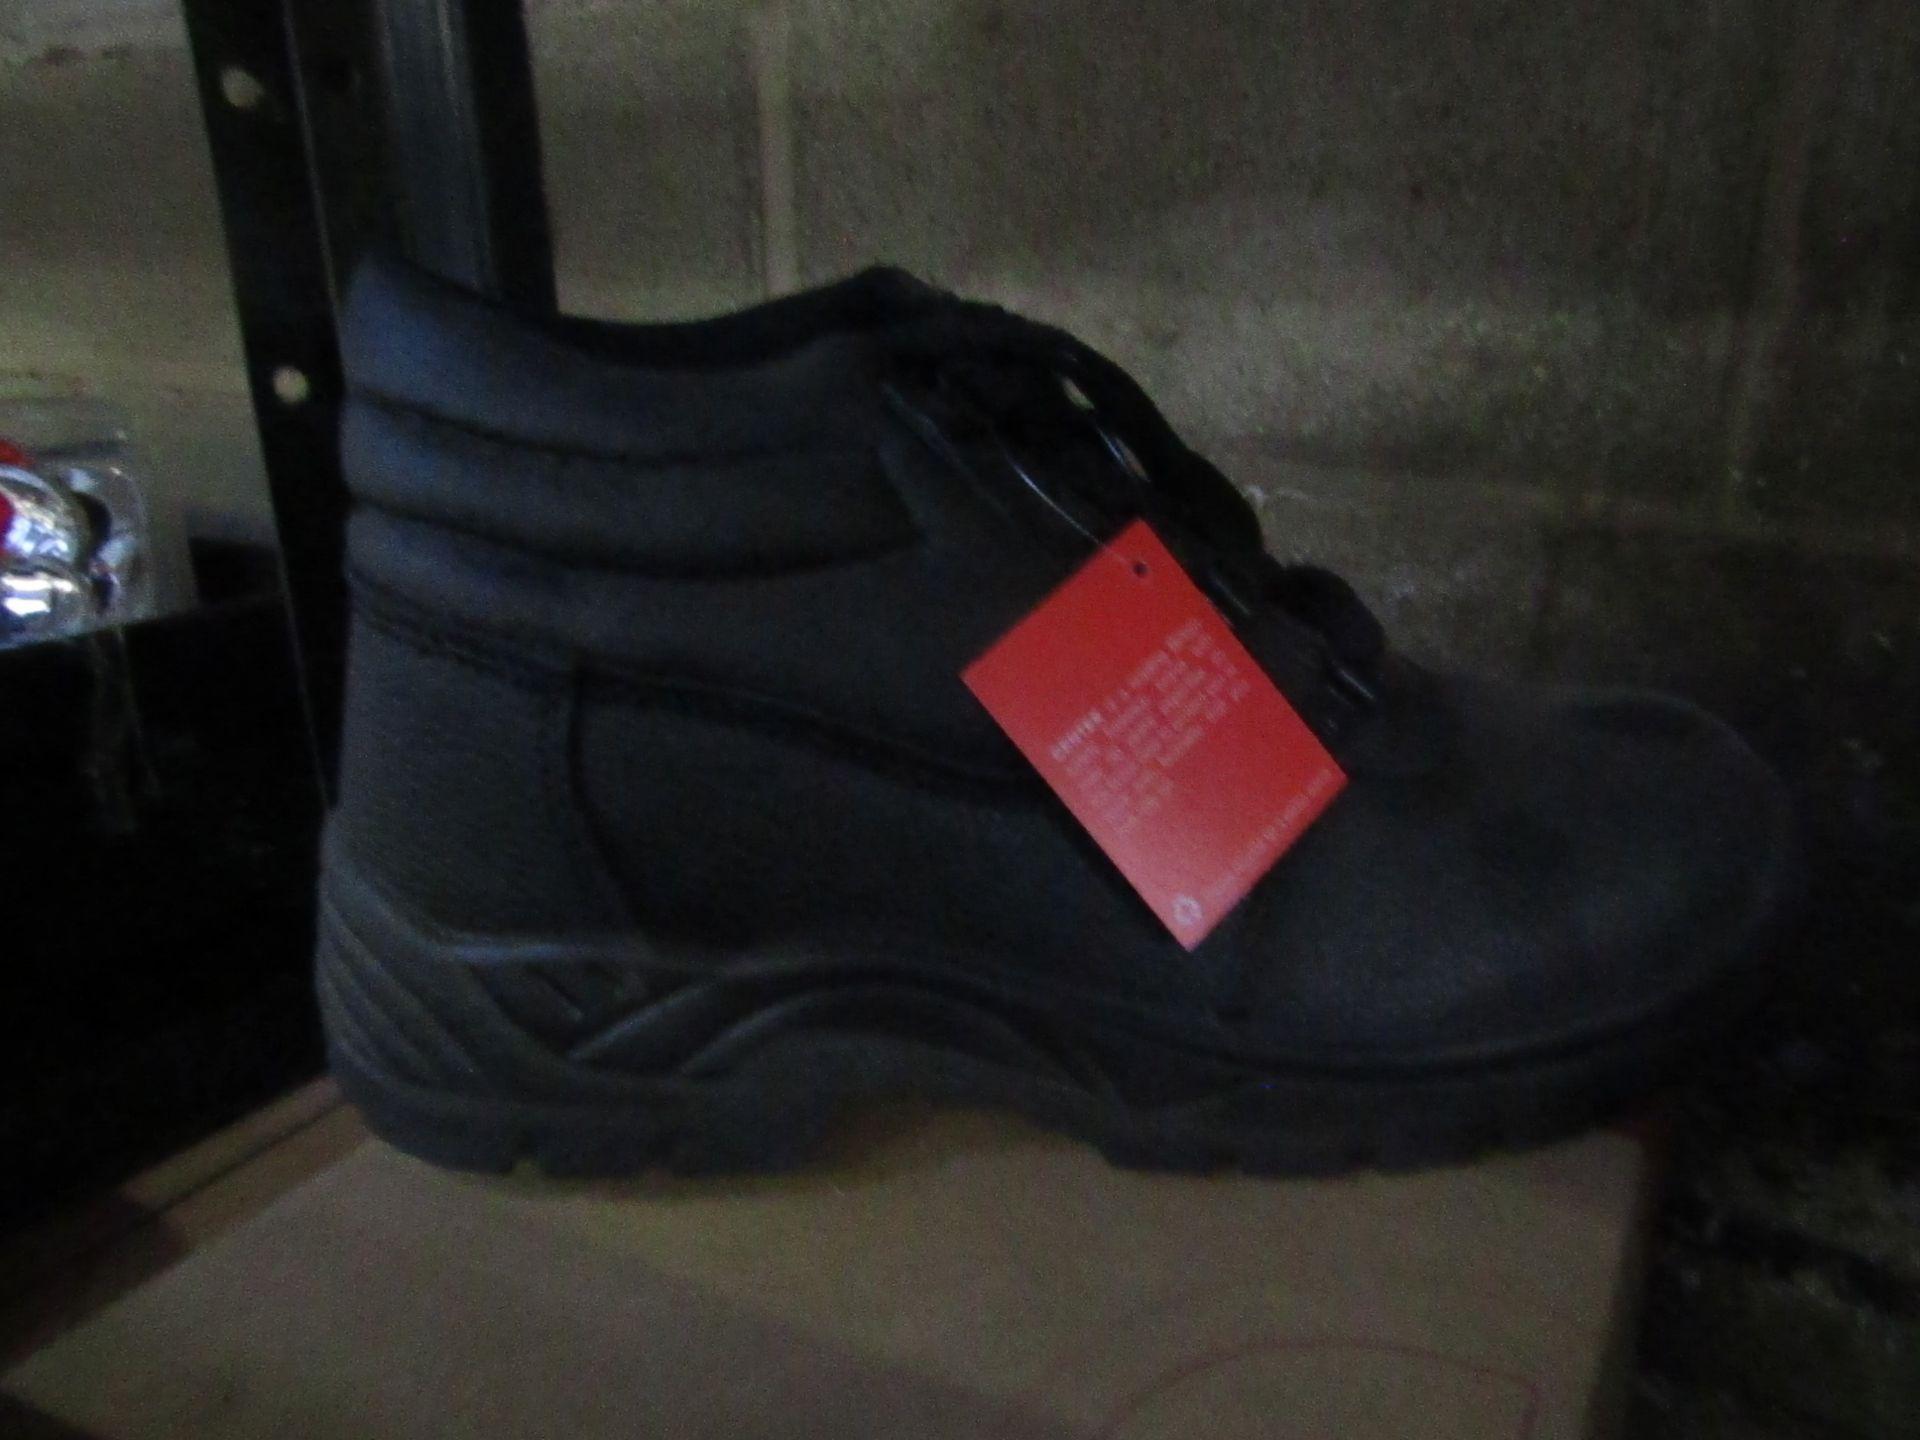 Centek - Black Steel Toe Cap Boot - Size 9 - New & Boxed.